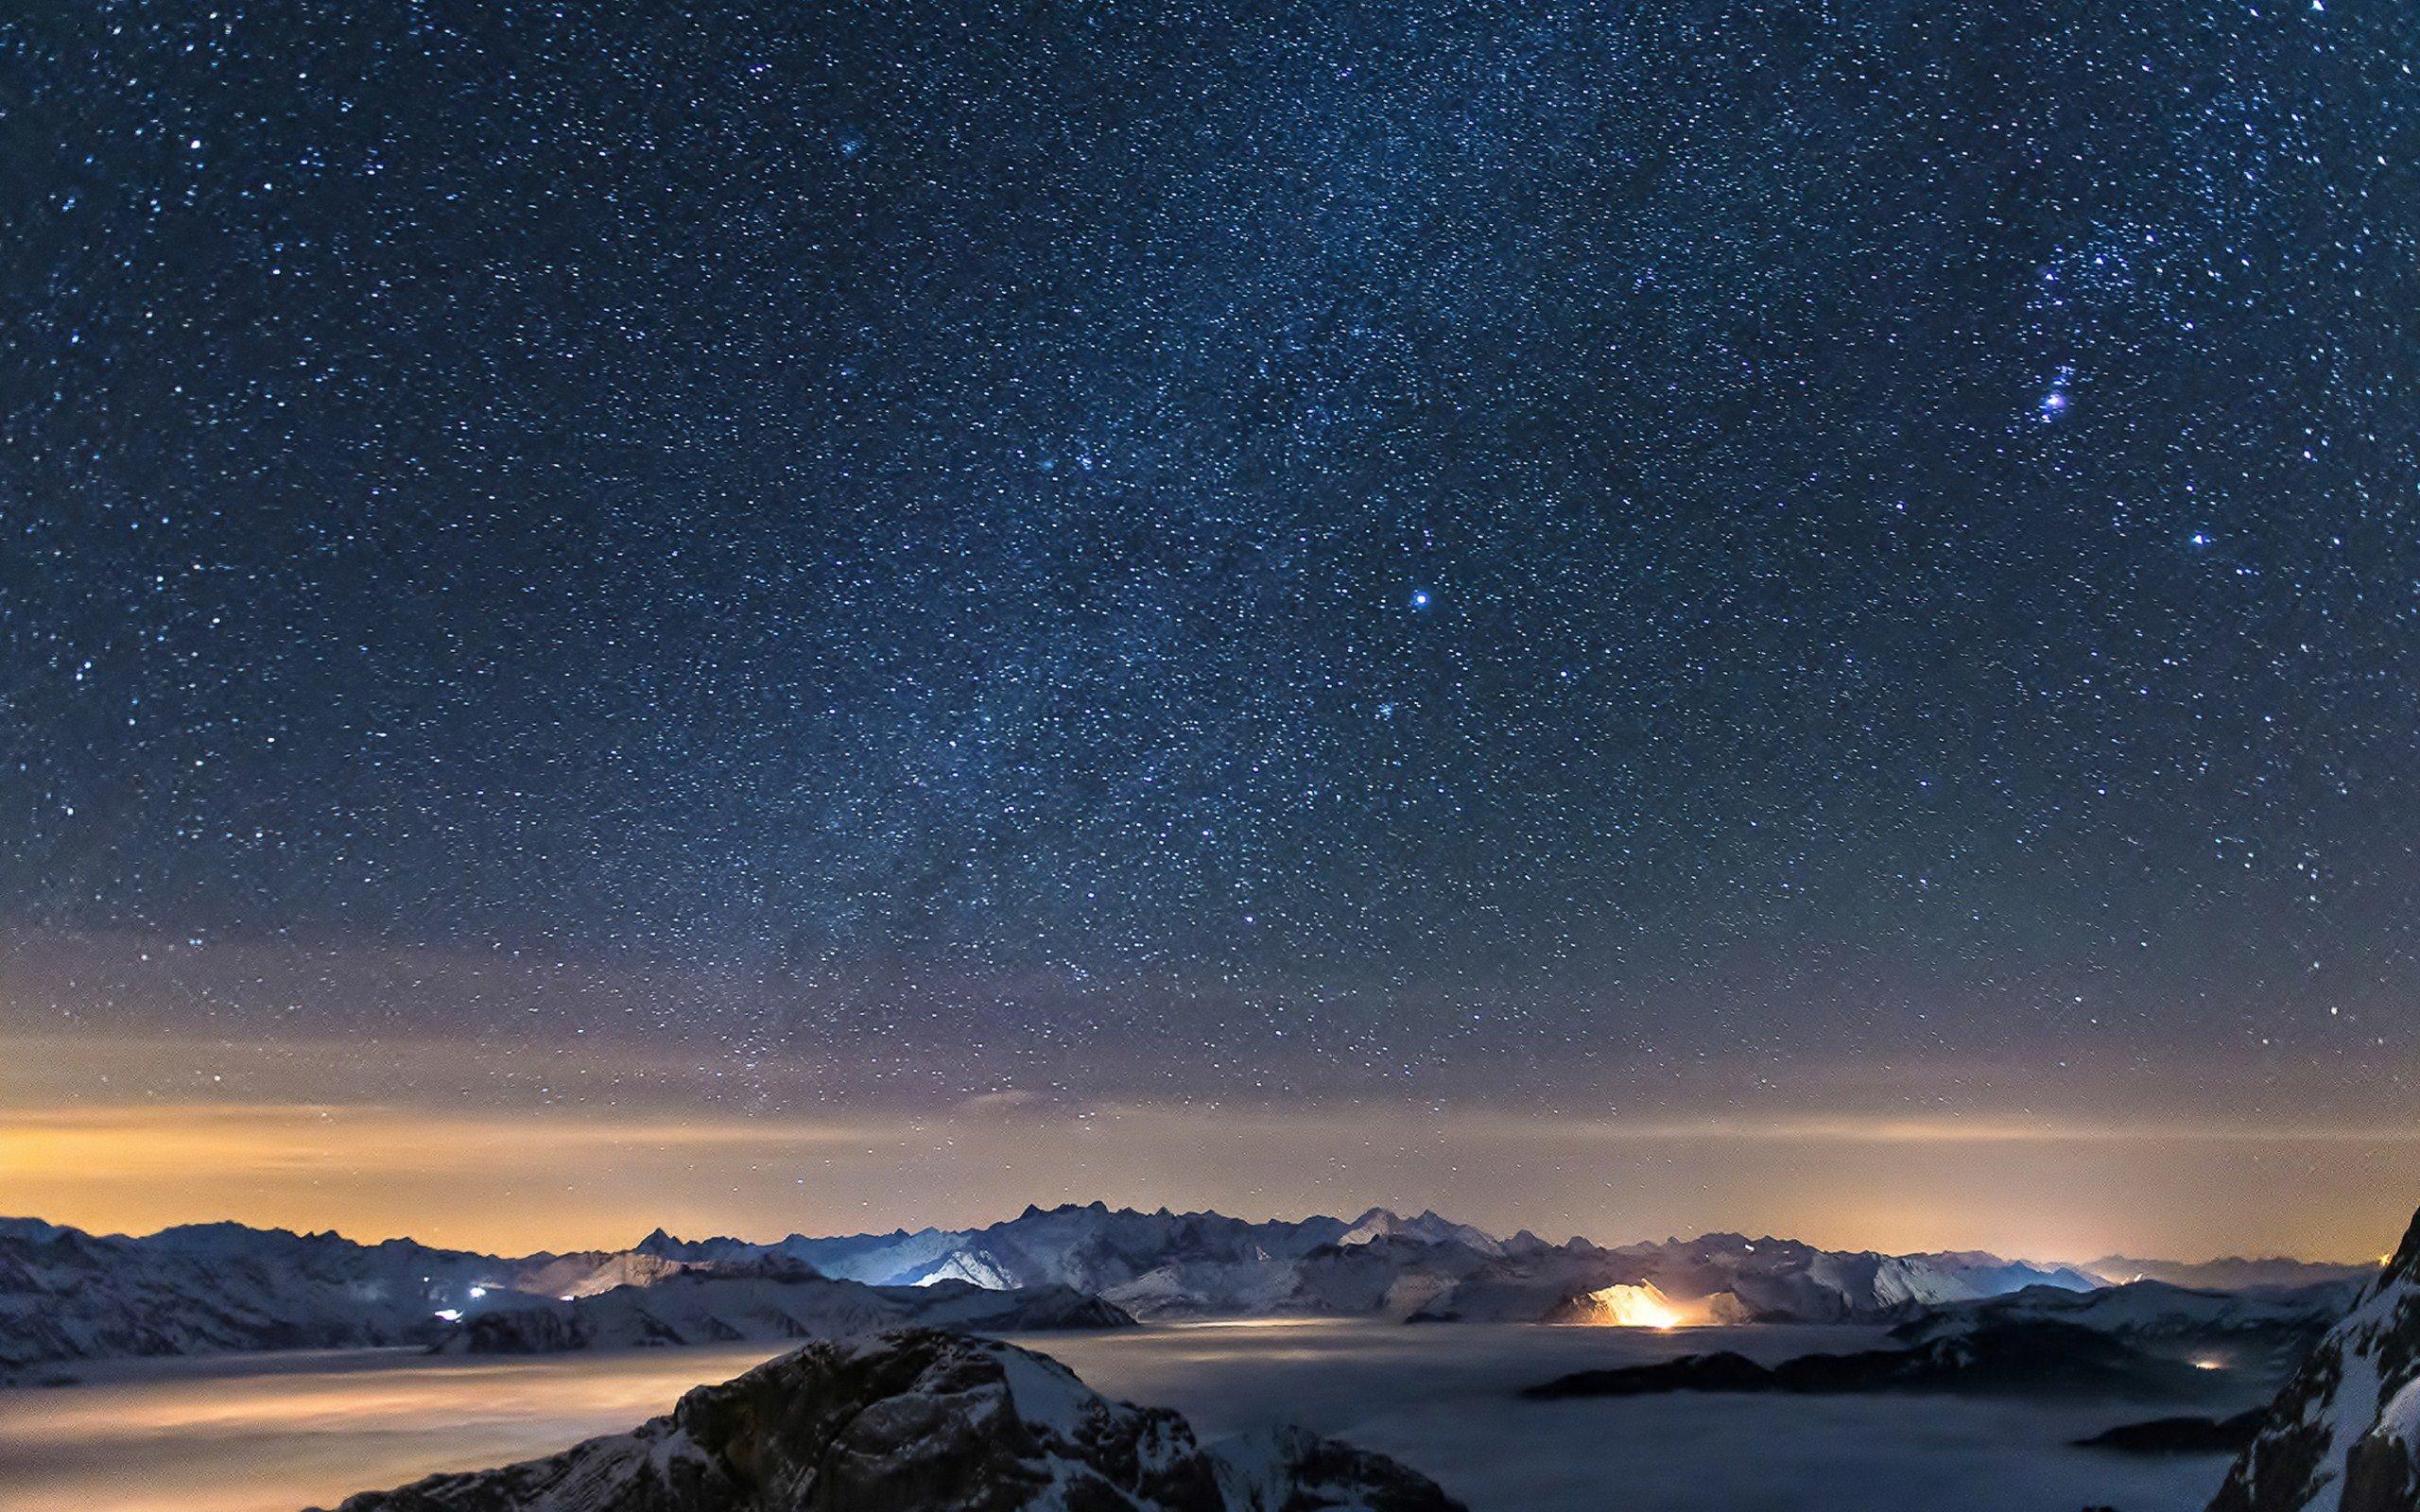 Nature Mountain Galaxy Night Landscape Fog Stars Ultrahd 4k